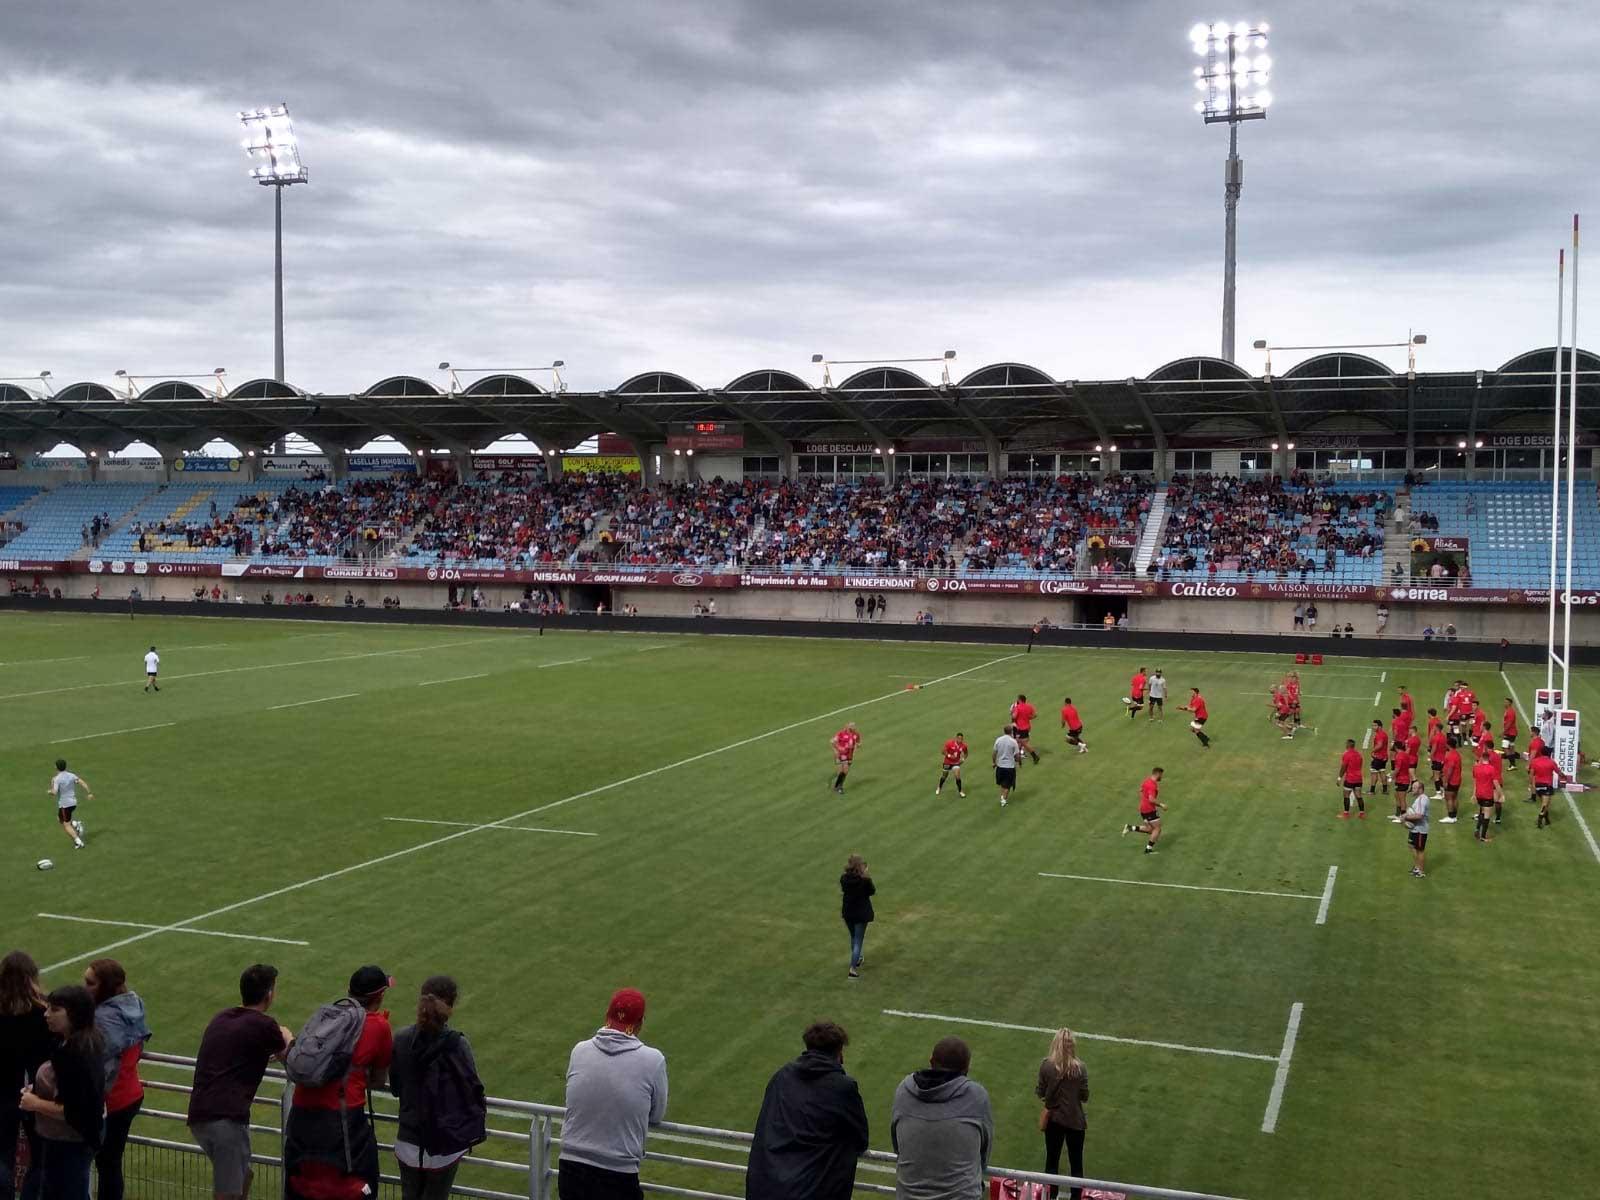 Stade Aimé Giral Perpignan